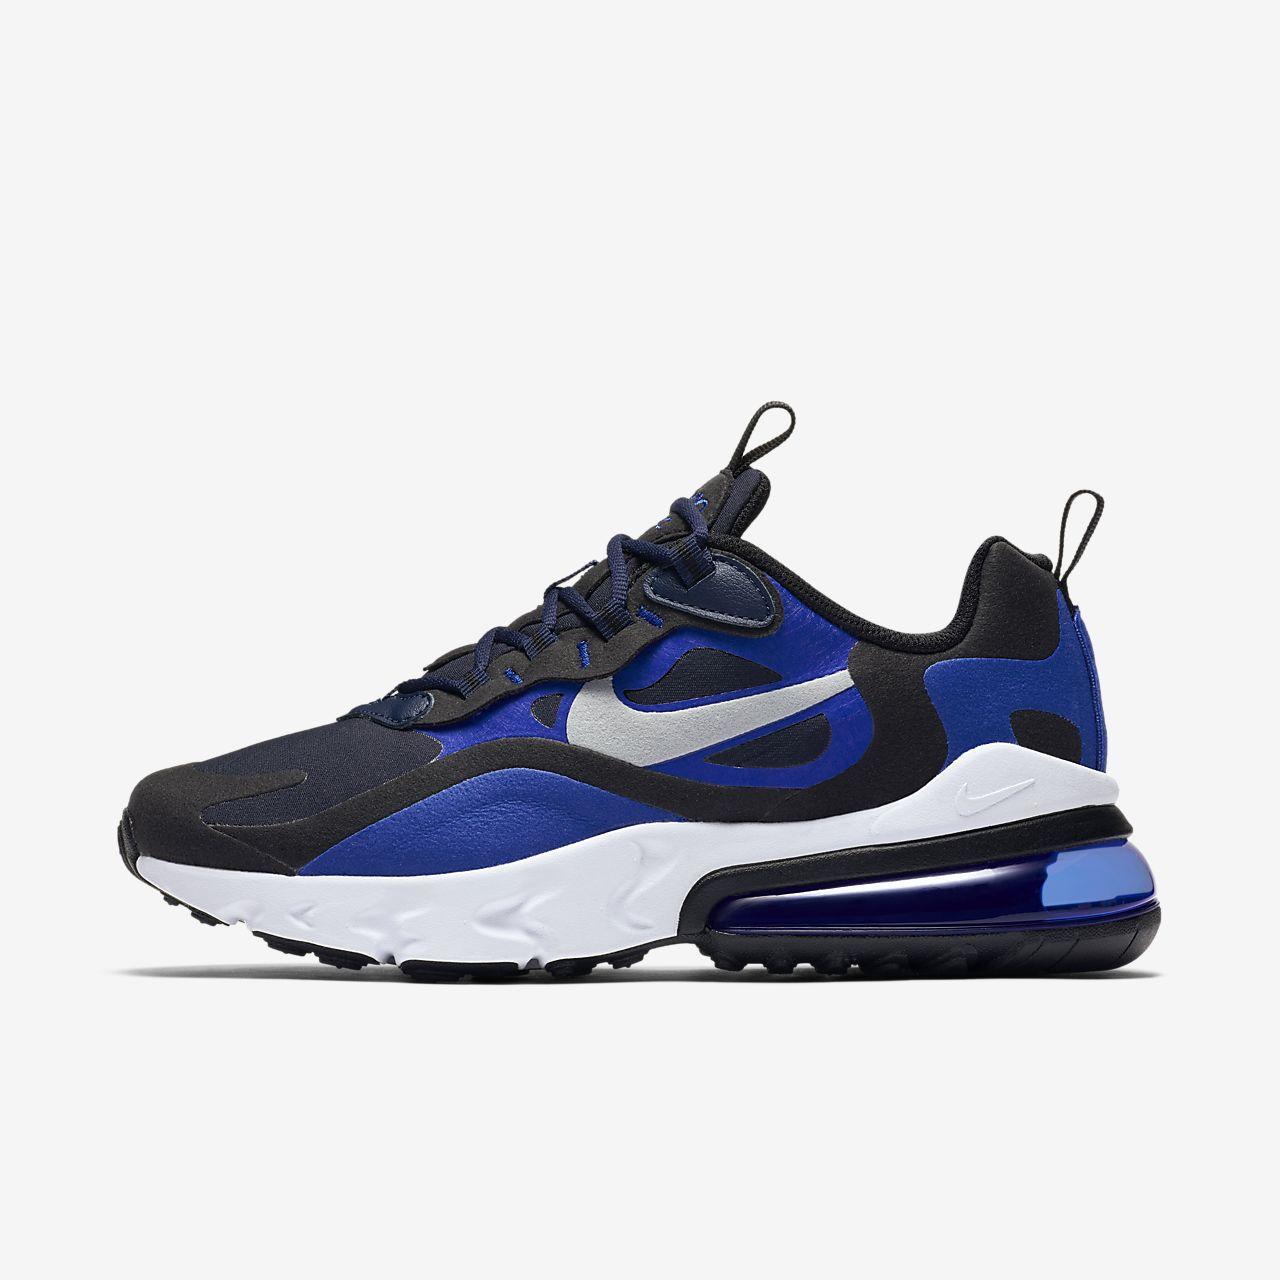 low priced e4f26 1b638 Nike Air Max 270 React Older Kids' Shoe